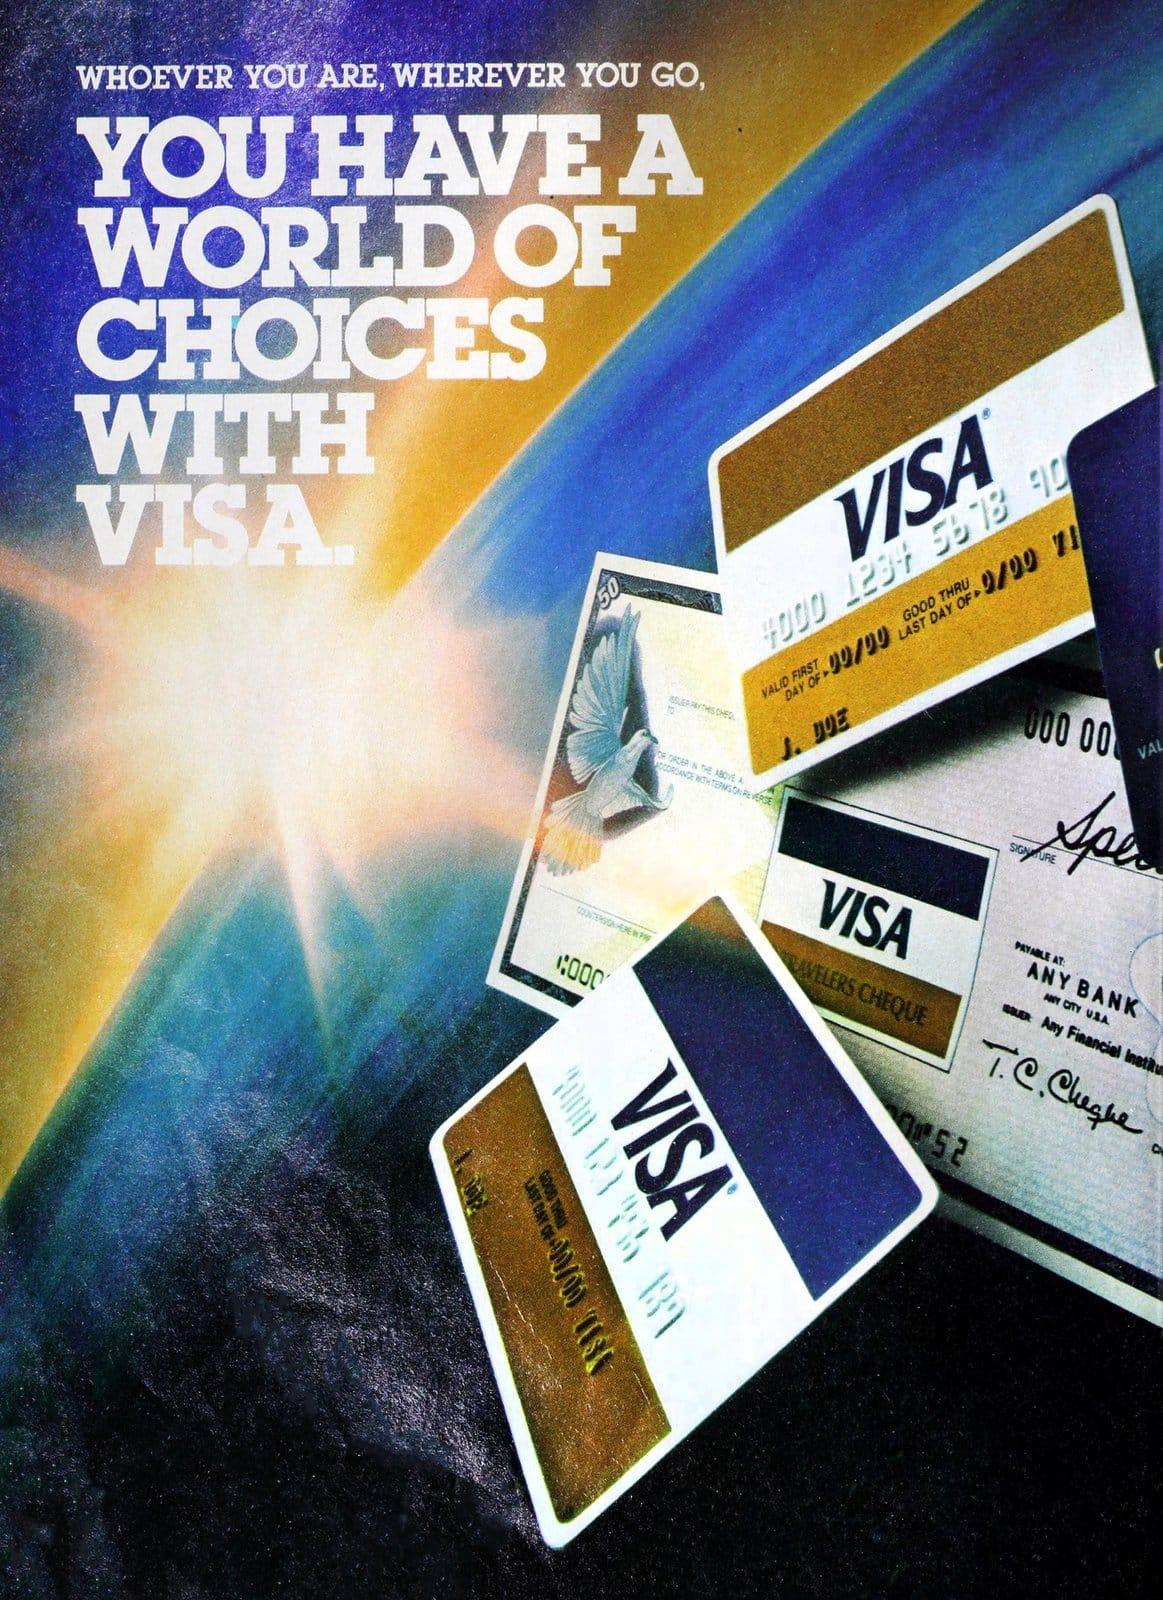 Old Visa cards in 1982